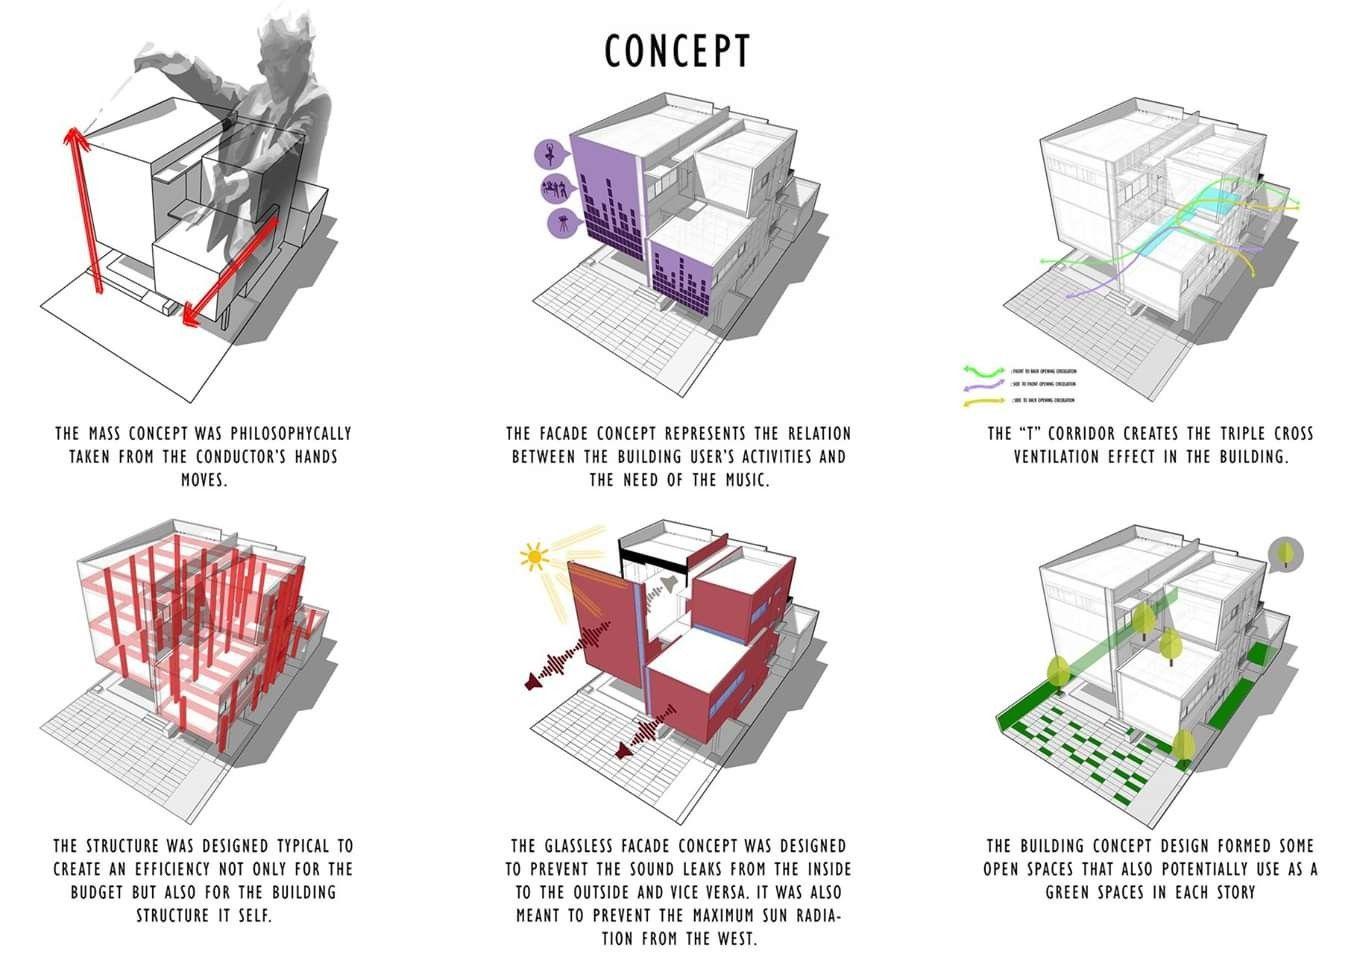 Gambar Arsitektur Oleh Mustafa Tuna Cengiz Pada Could Be